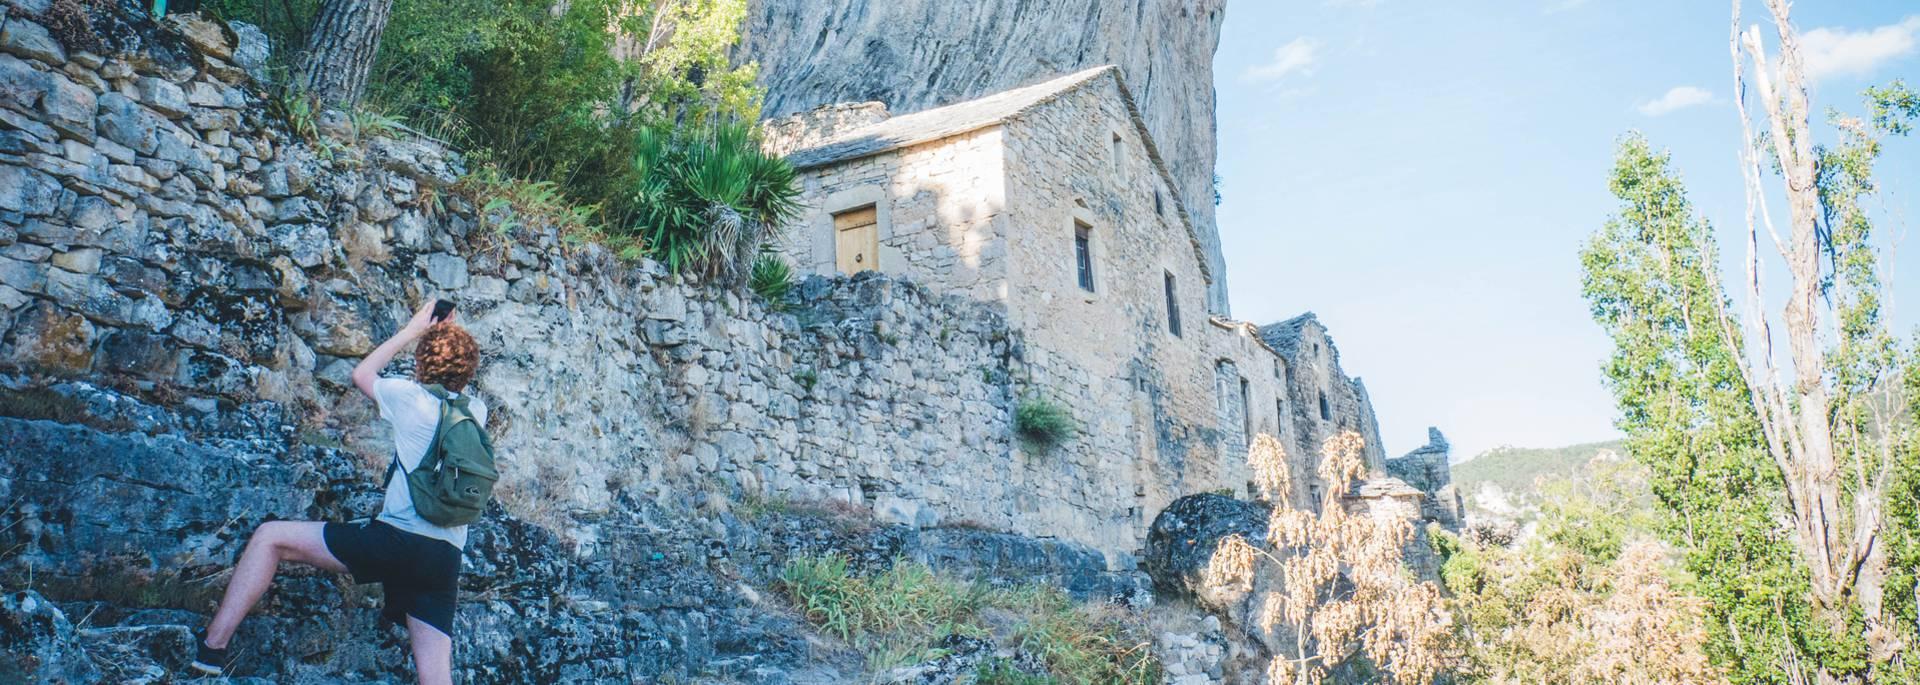 Eglazines, village perché des Gorges du Tarn